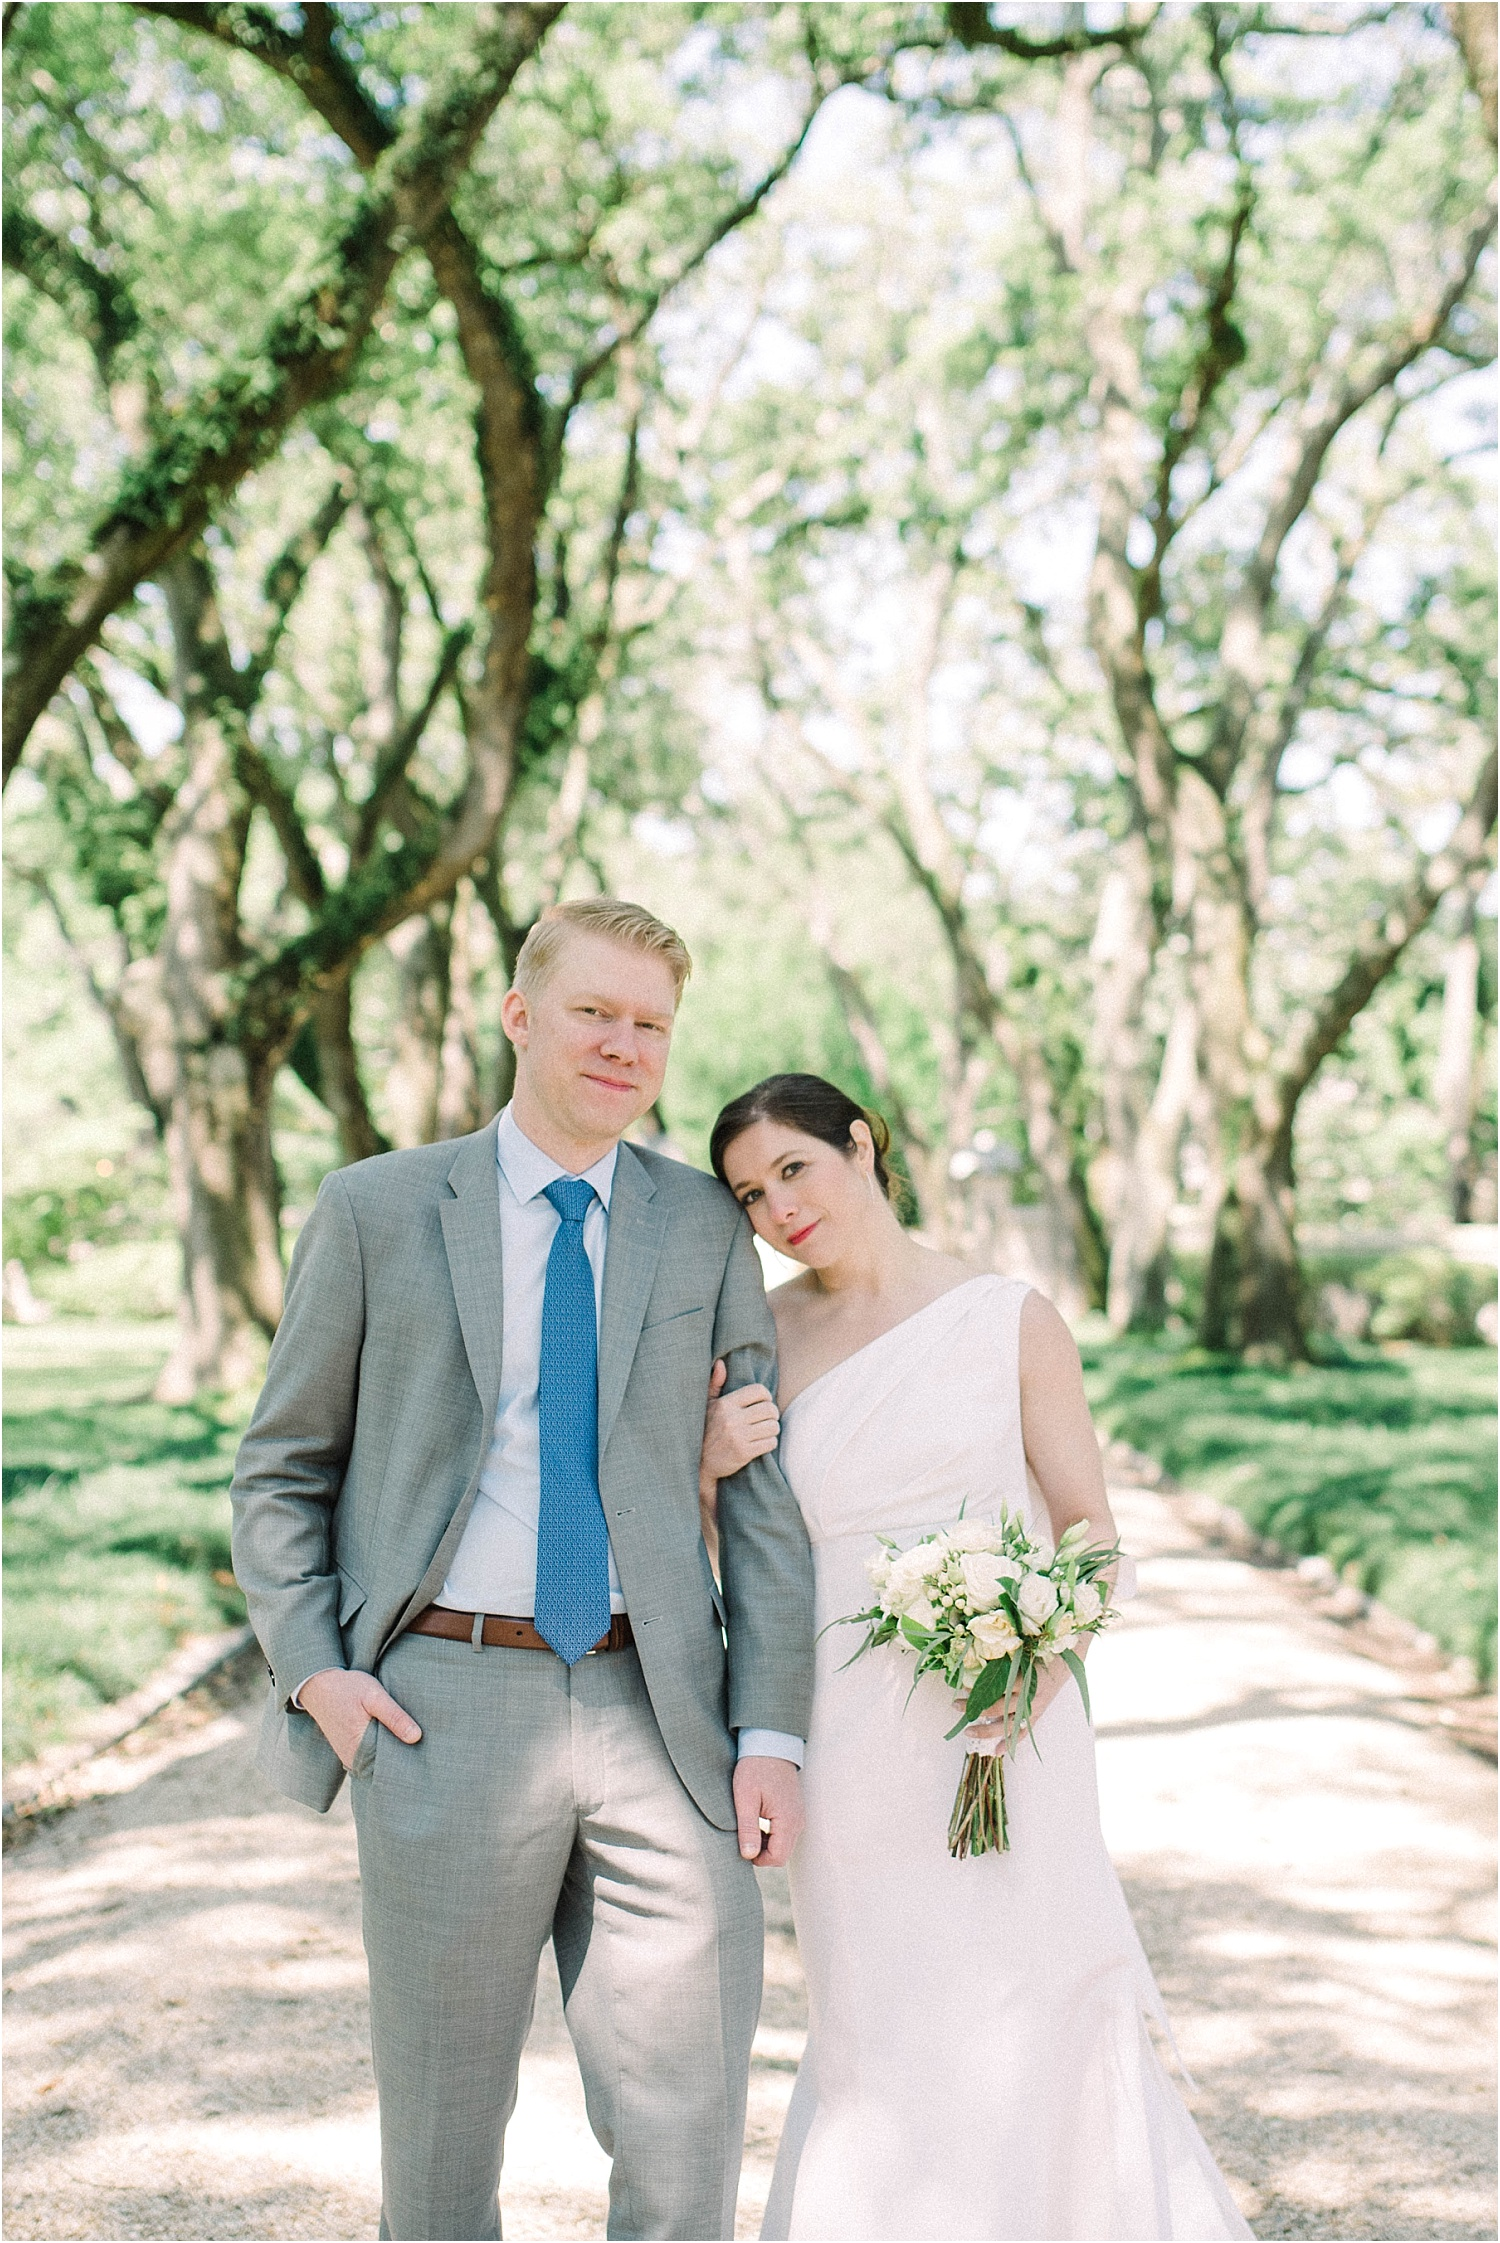 Heather + Scott-Longue-Vue-house-and-gardens-black-tie-wedding-photos_Gabby Chapin_Print_0064_BLOG.jpg